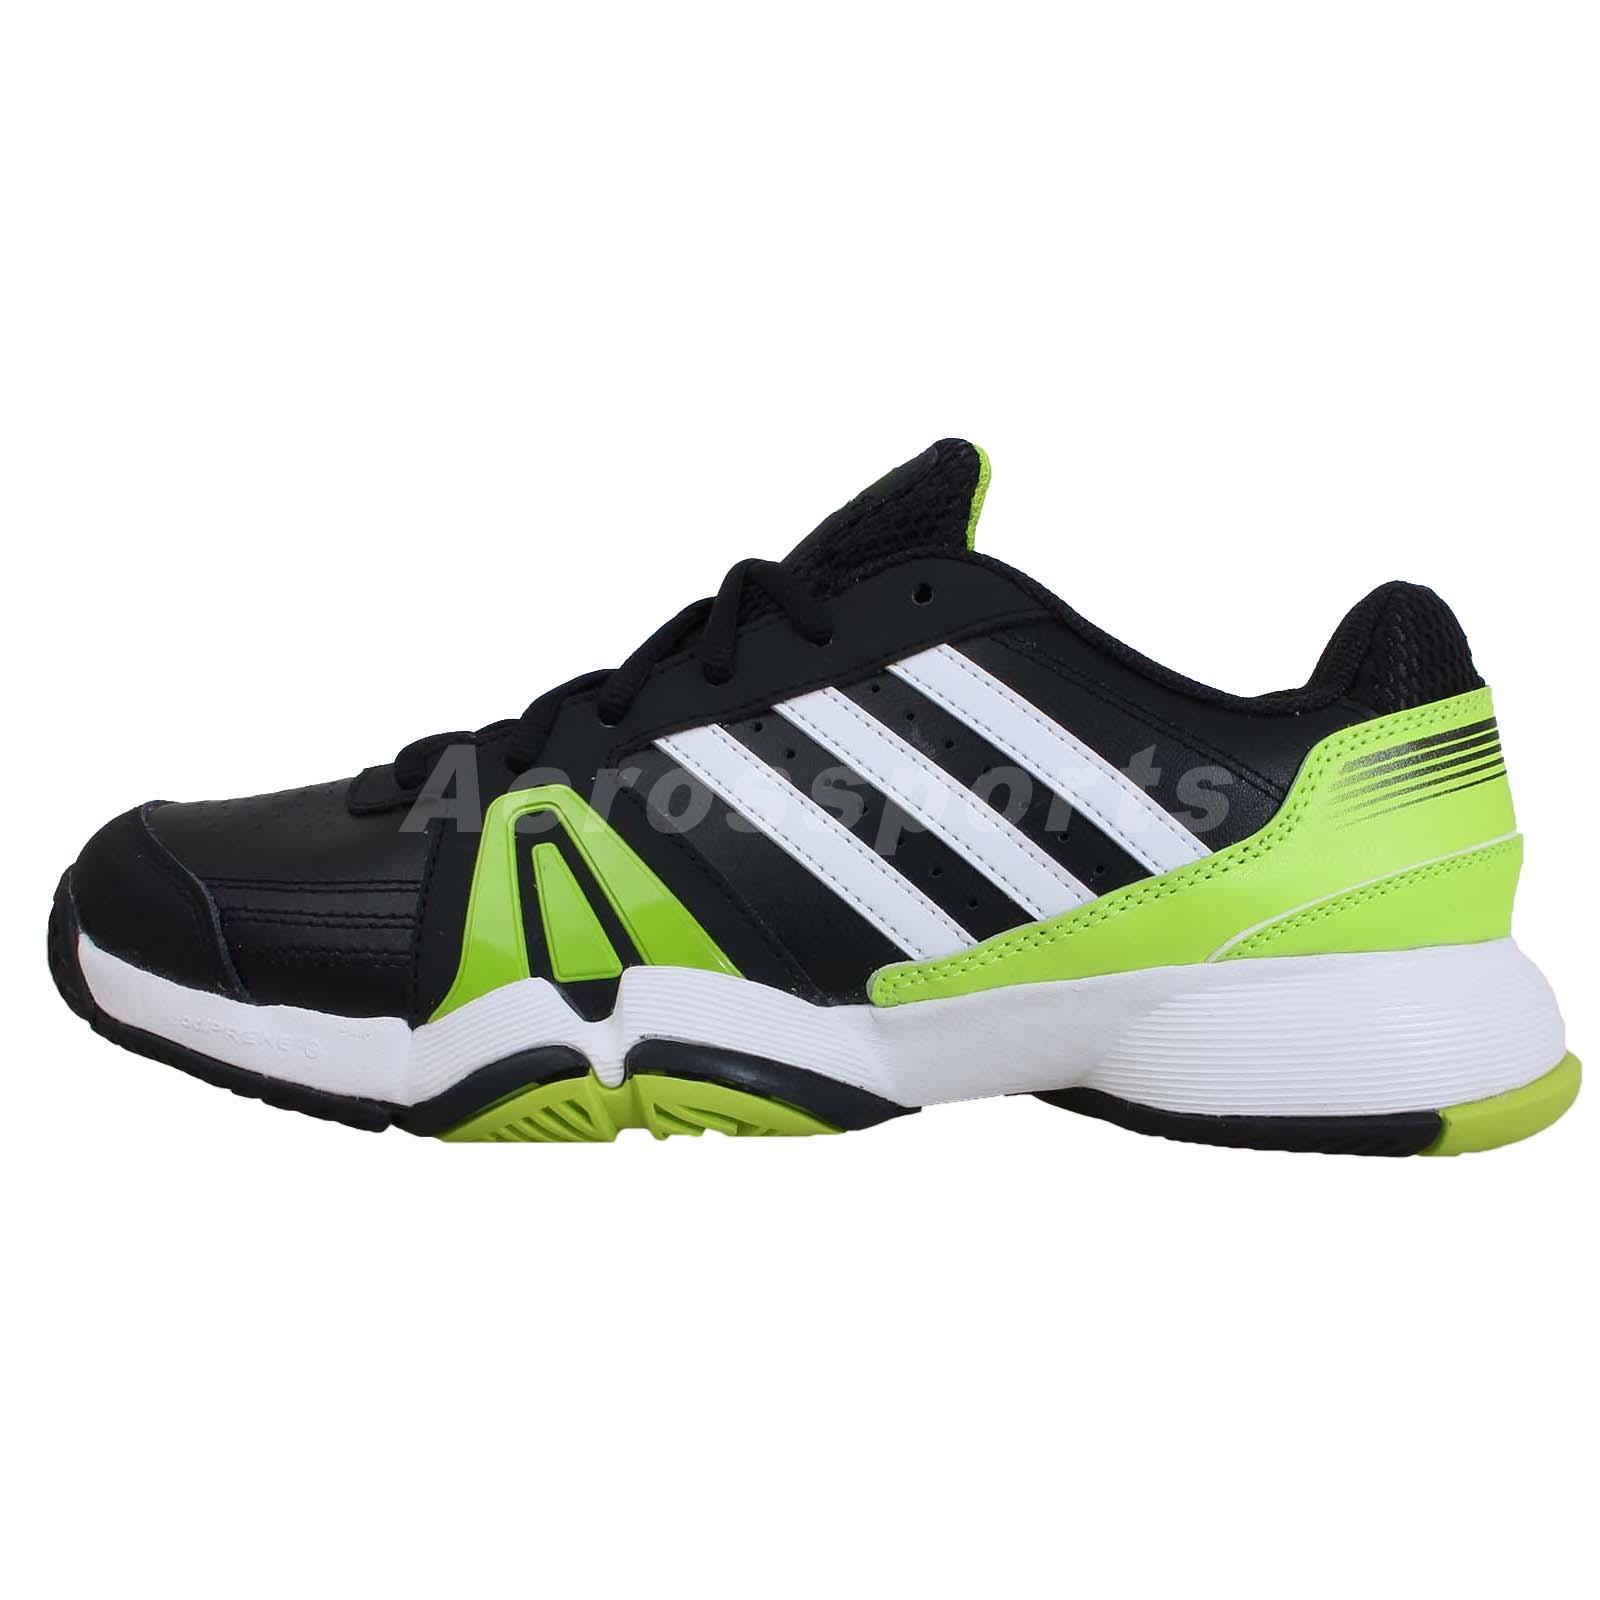 adidas bercuda 3 black white green 2014 mens tennis shoes